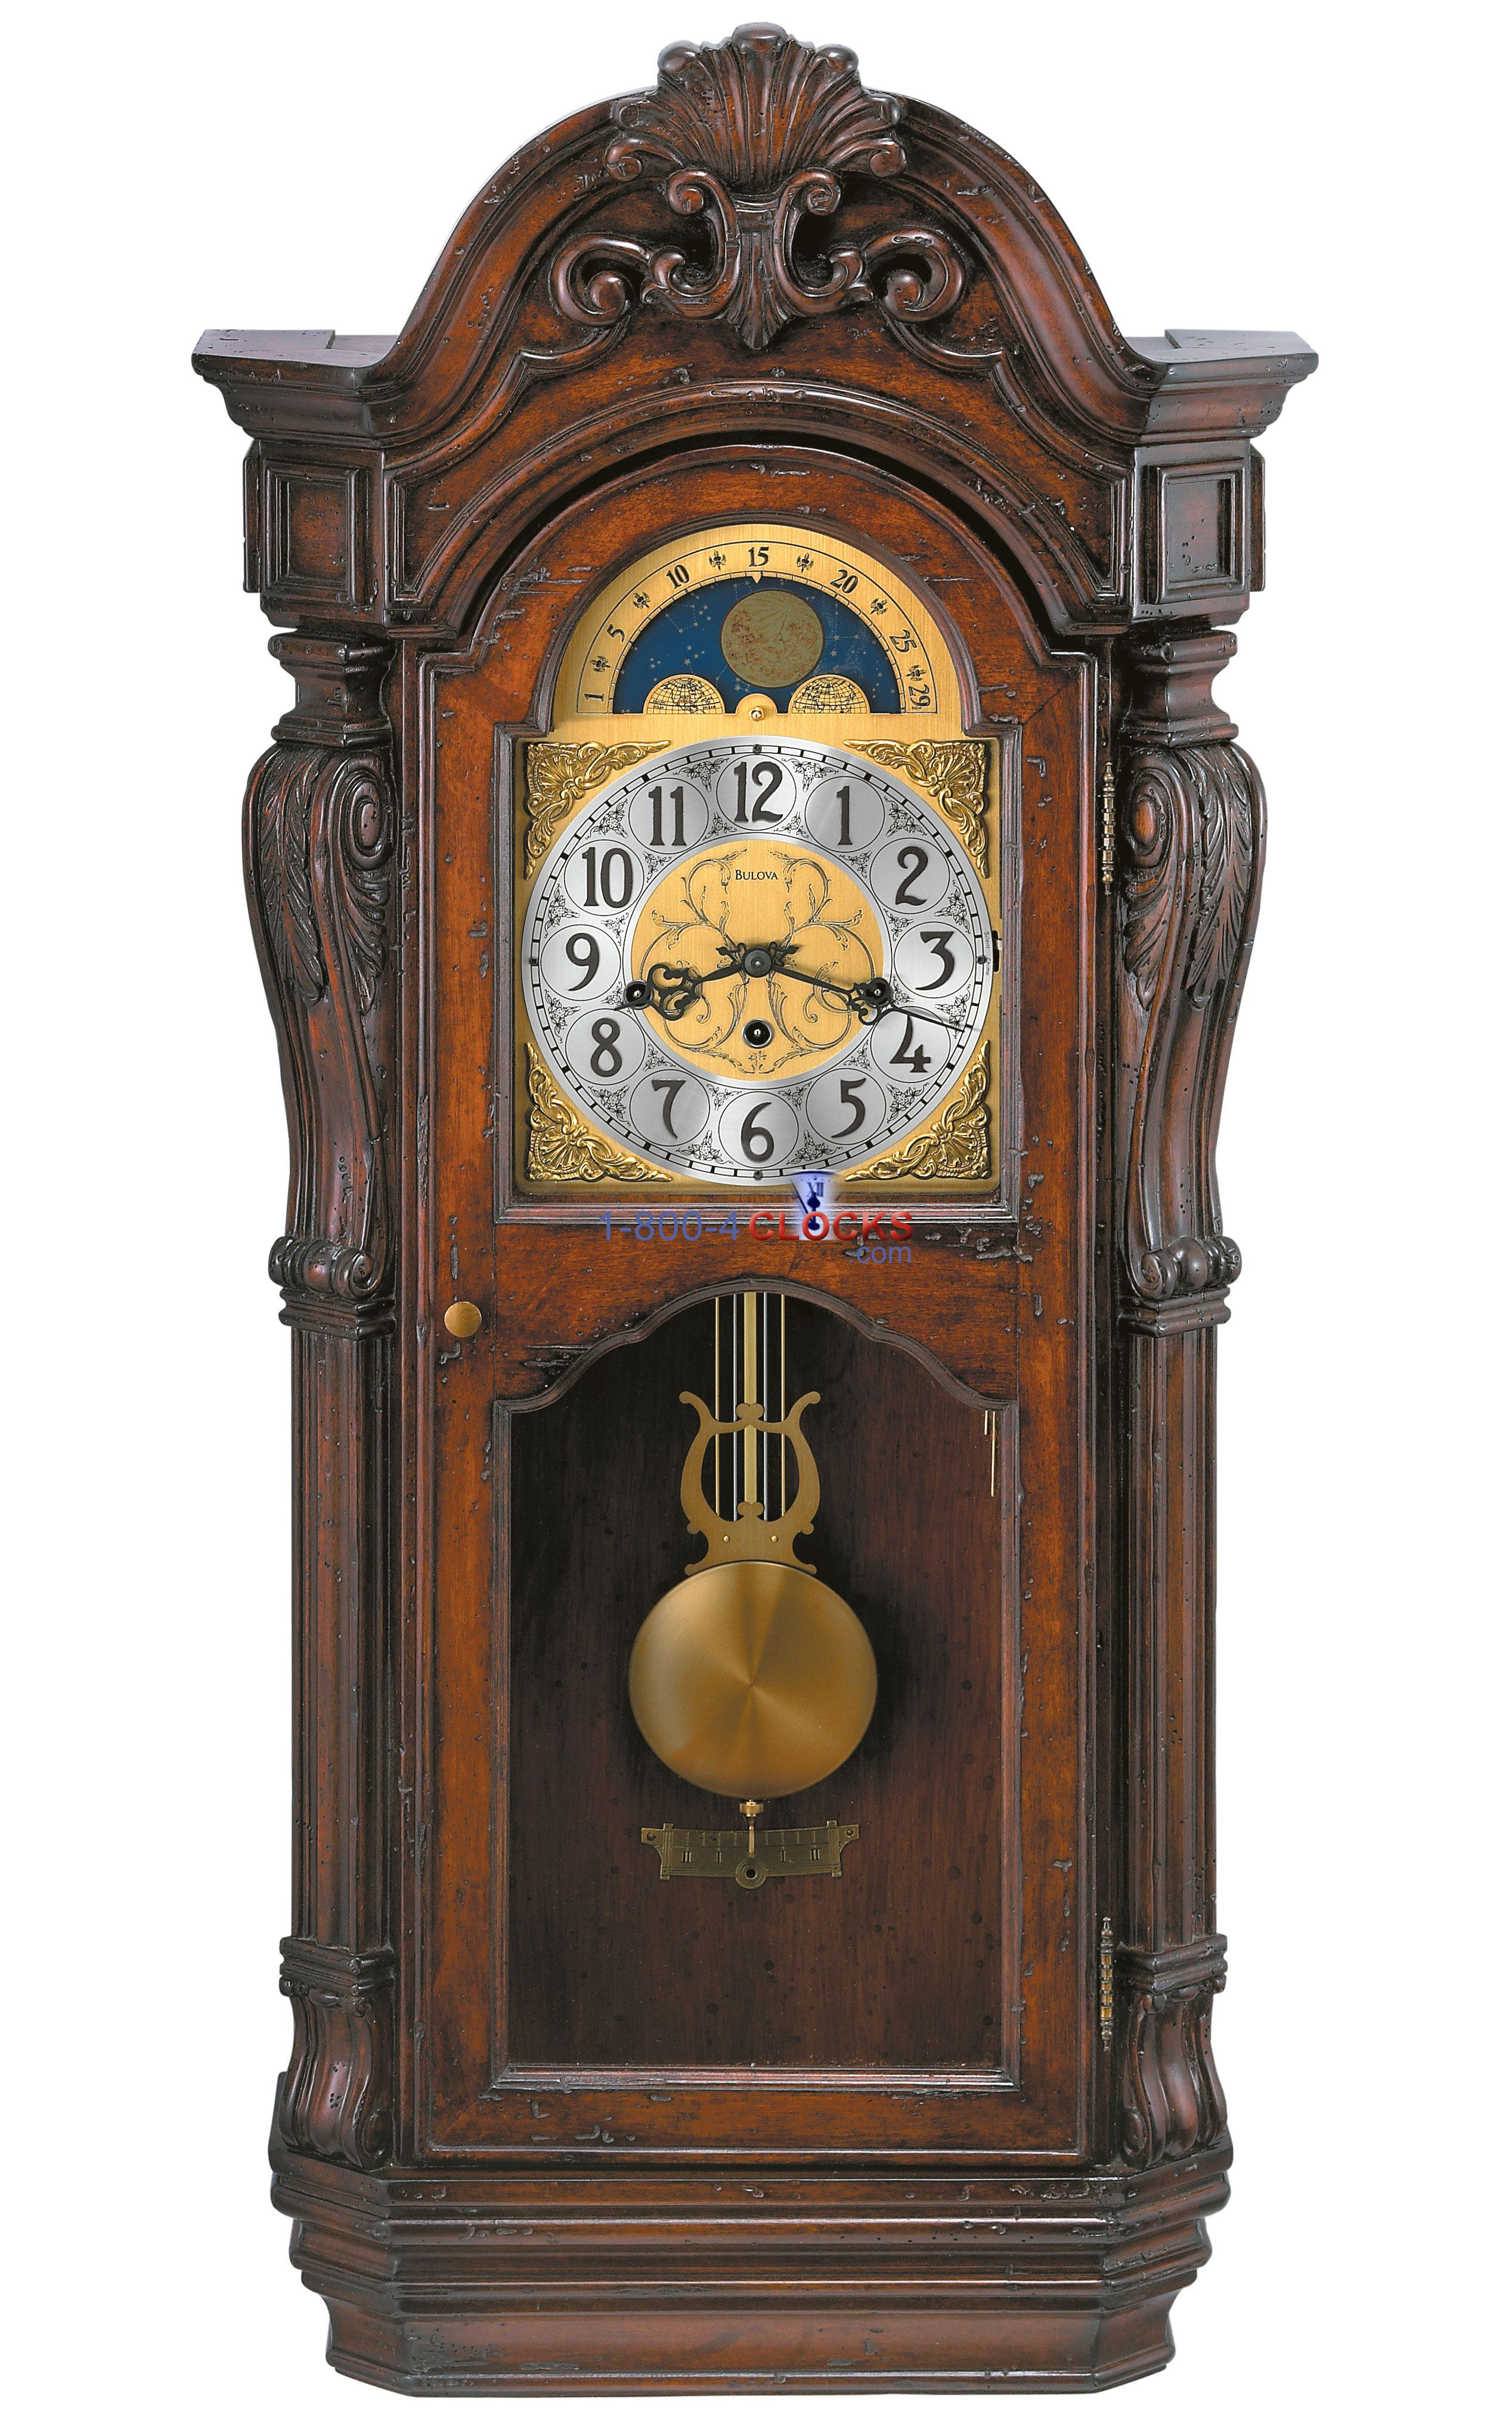 Bulova Canterbury Wall Clock Grandfather Clocks Howard Miller Antique American